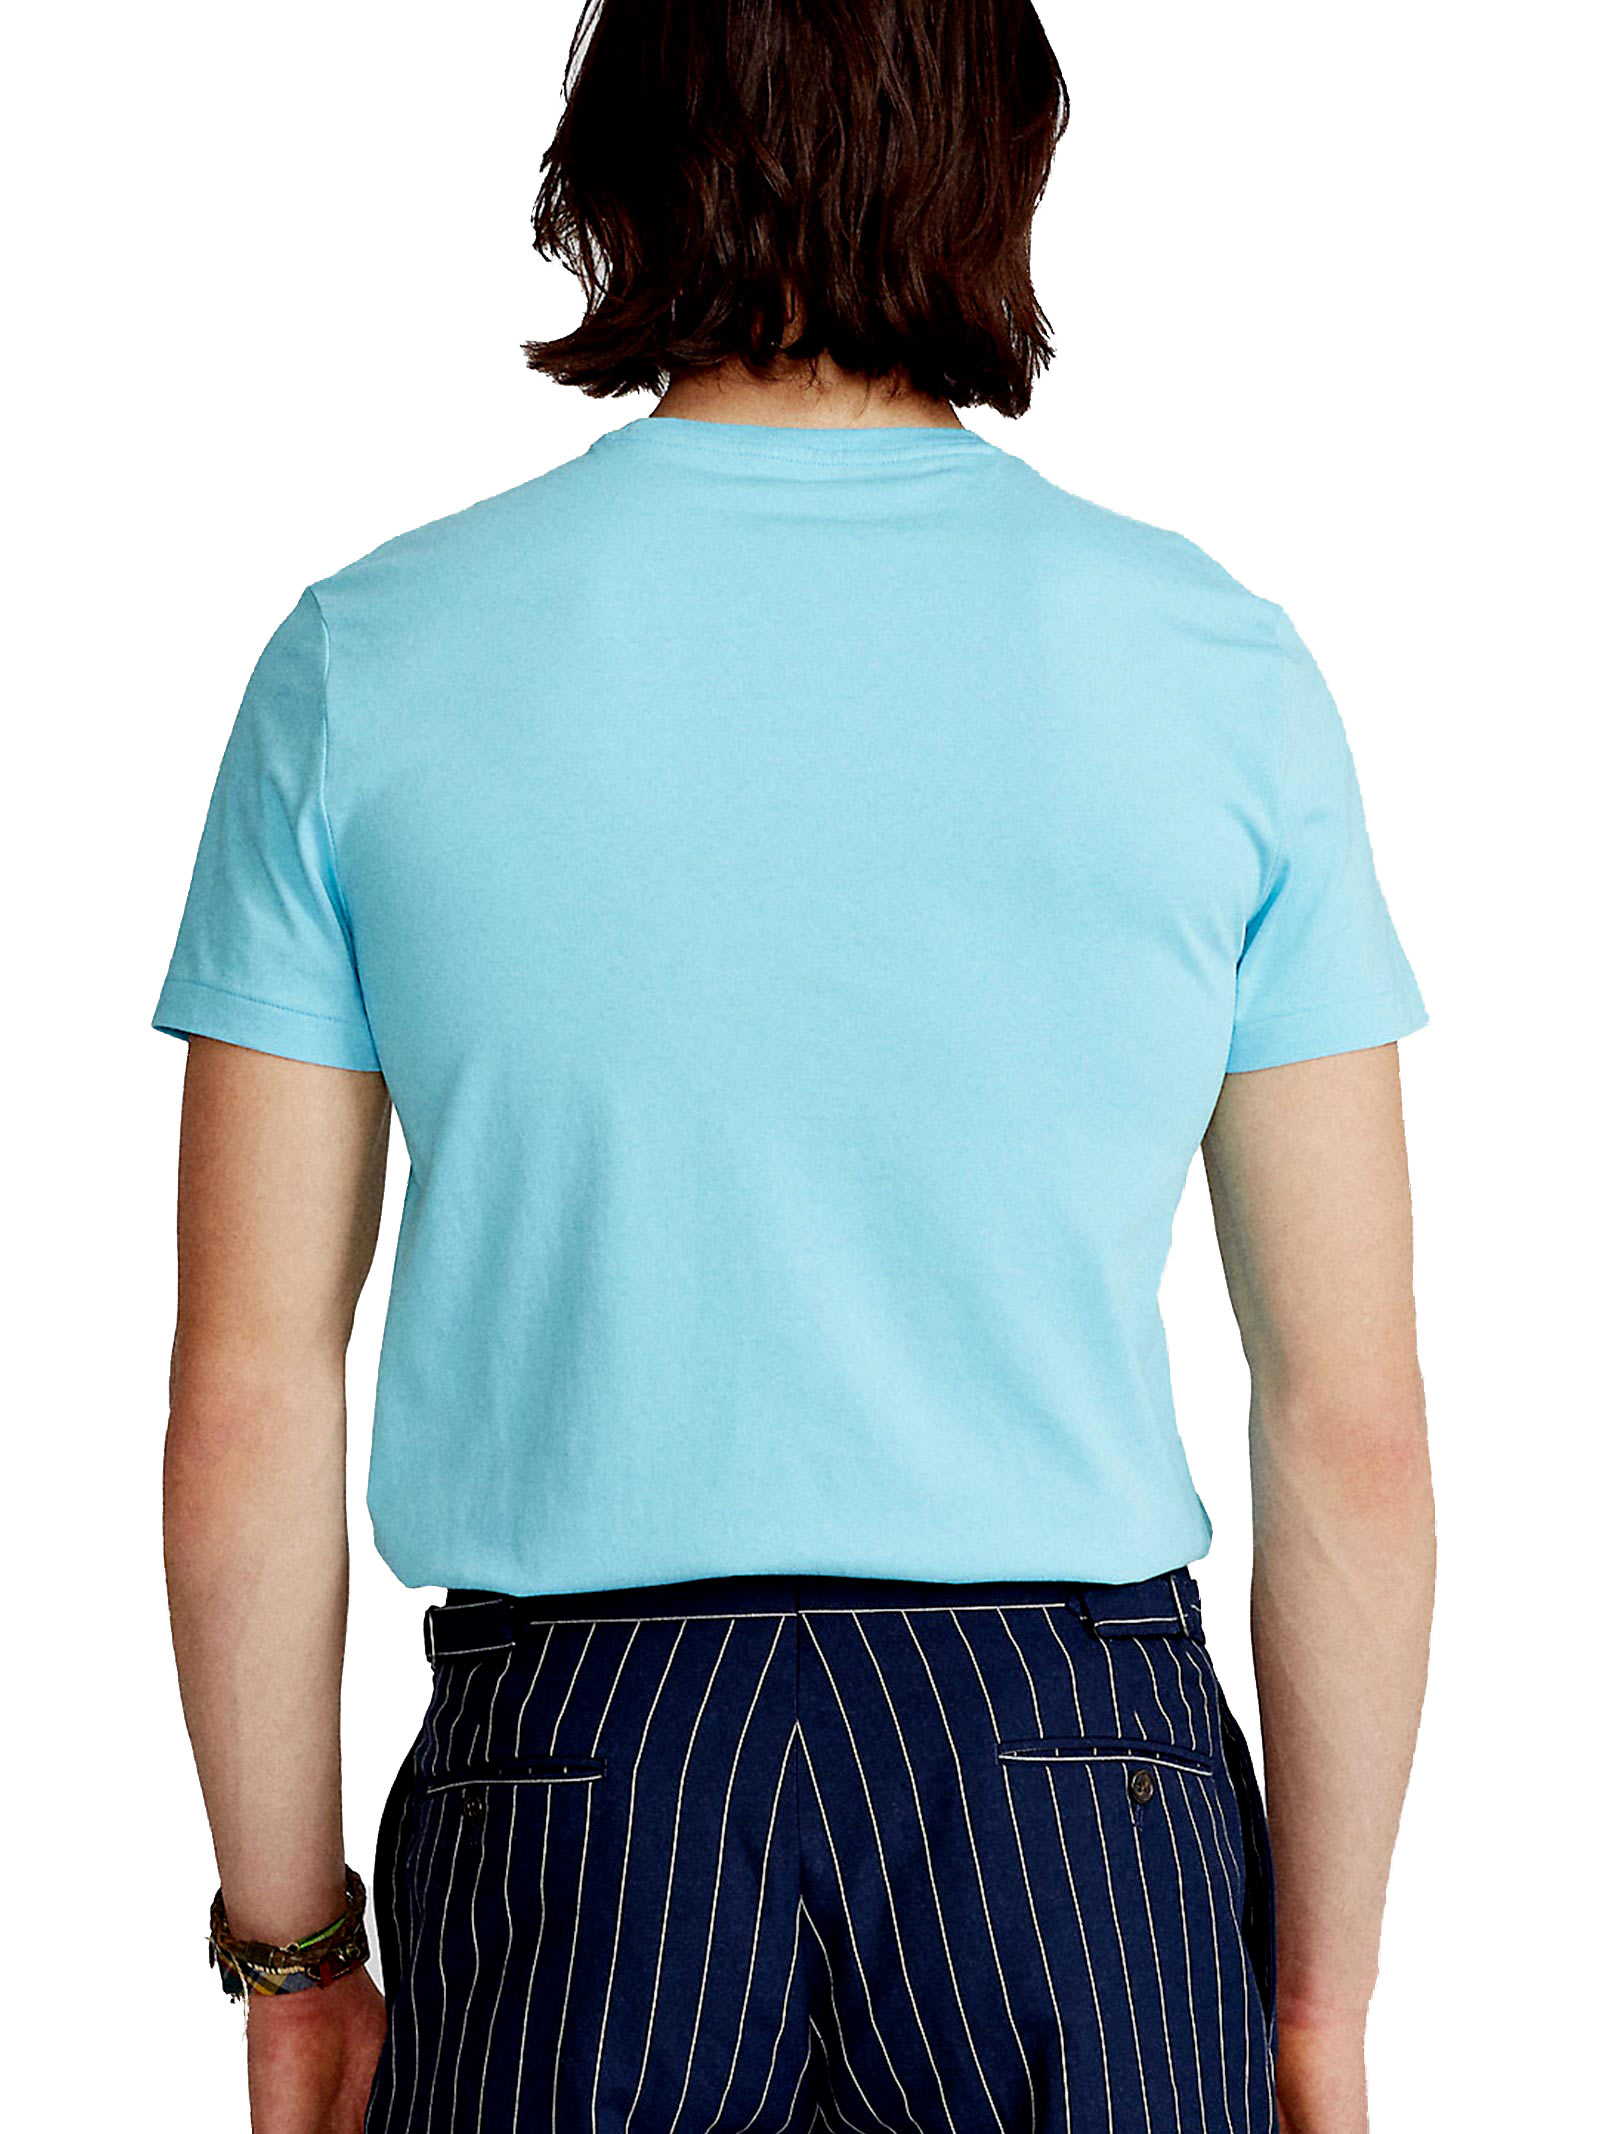 T-shirt azzurro girocollo slimfit RALPH LAUREN | T-shirt | 710-671438216